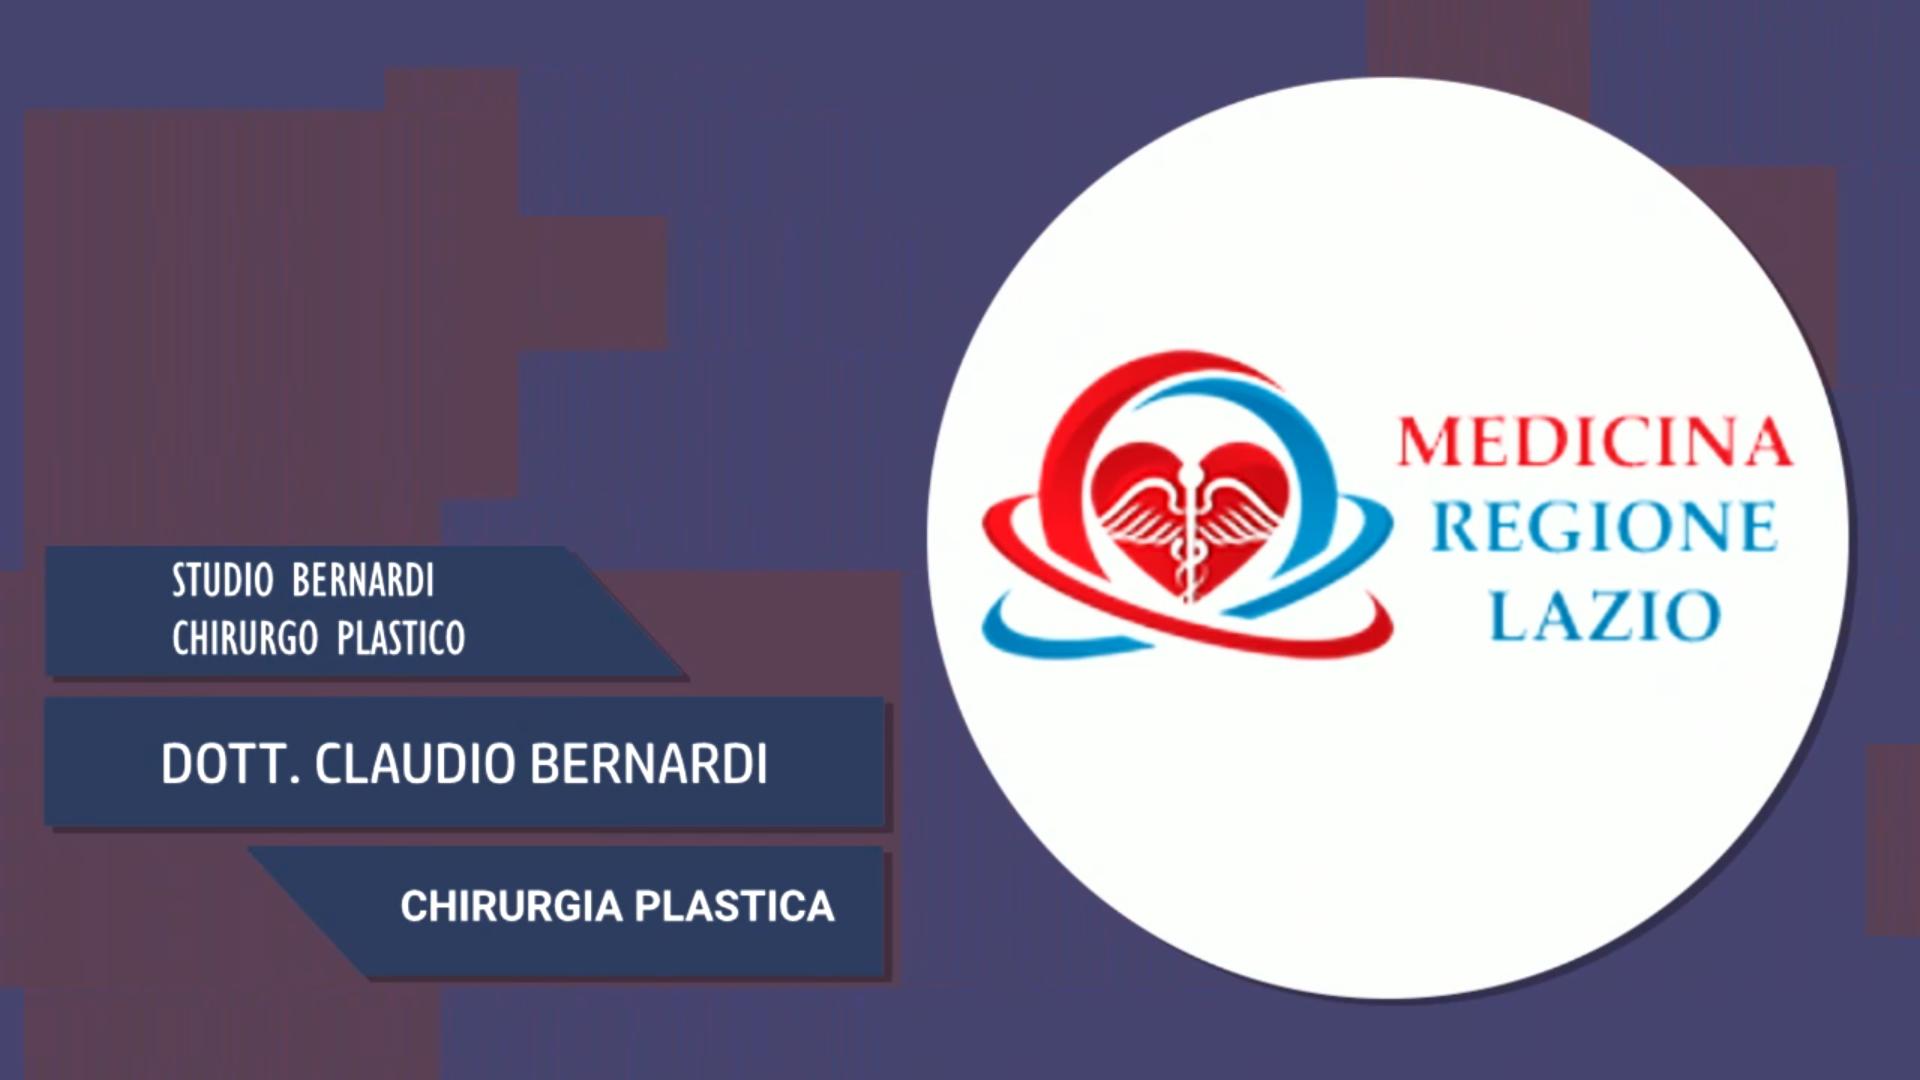 Intervista al Dott. Claudio Bernardi – Chirurgia Plastica